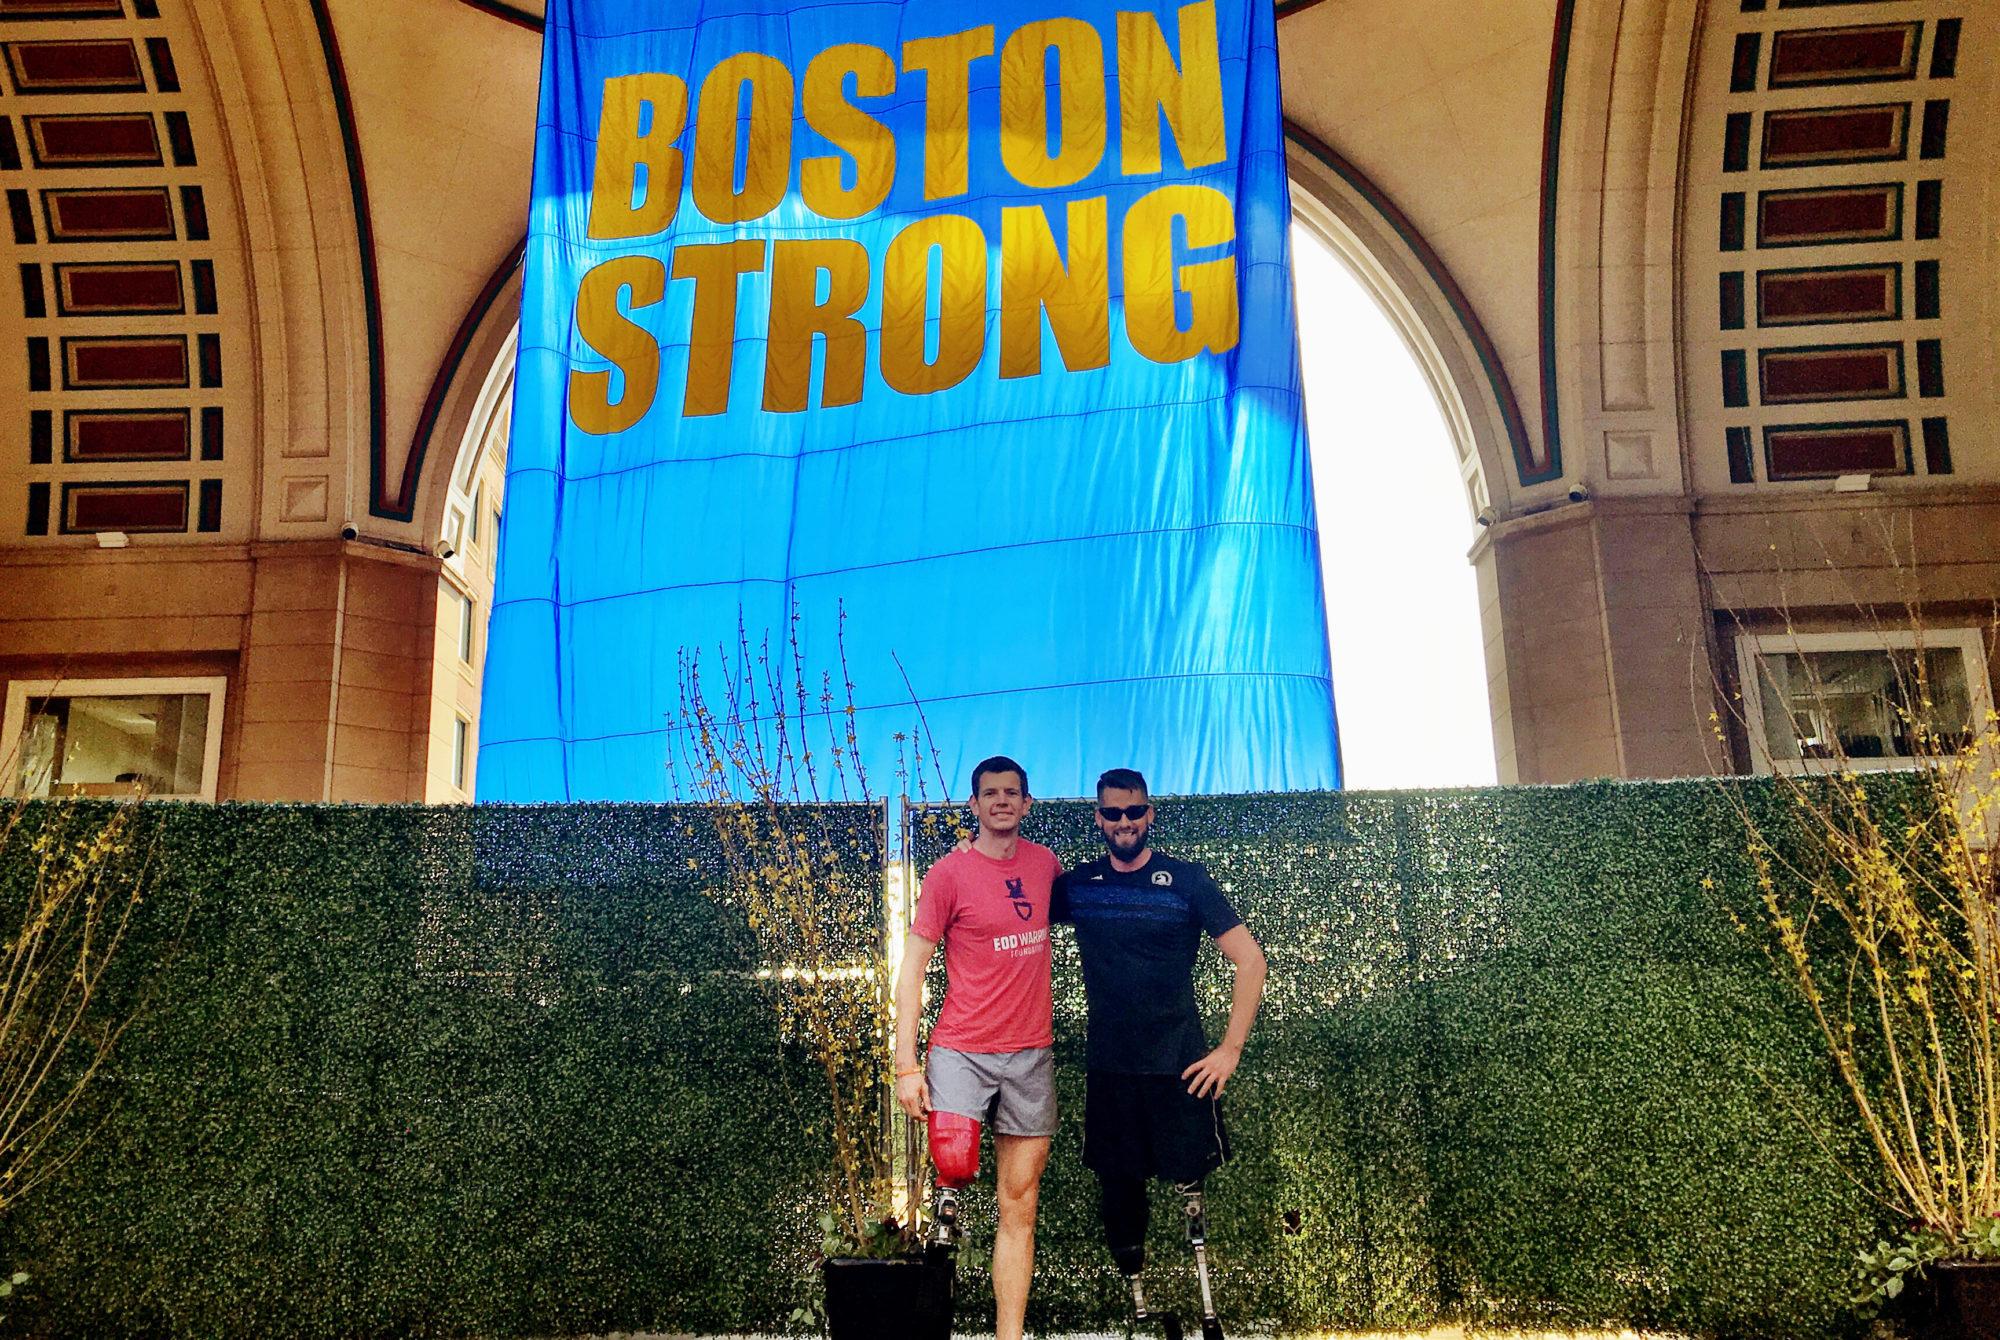 MEDIA CREDIT: COURTESY BY ADAM POPP  Adam Popp, a first-year graduate student and Air Force veteran, ran the Boston Marathon alongside tens of thousands of runners last week.